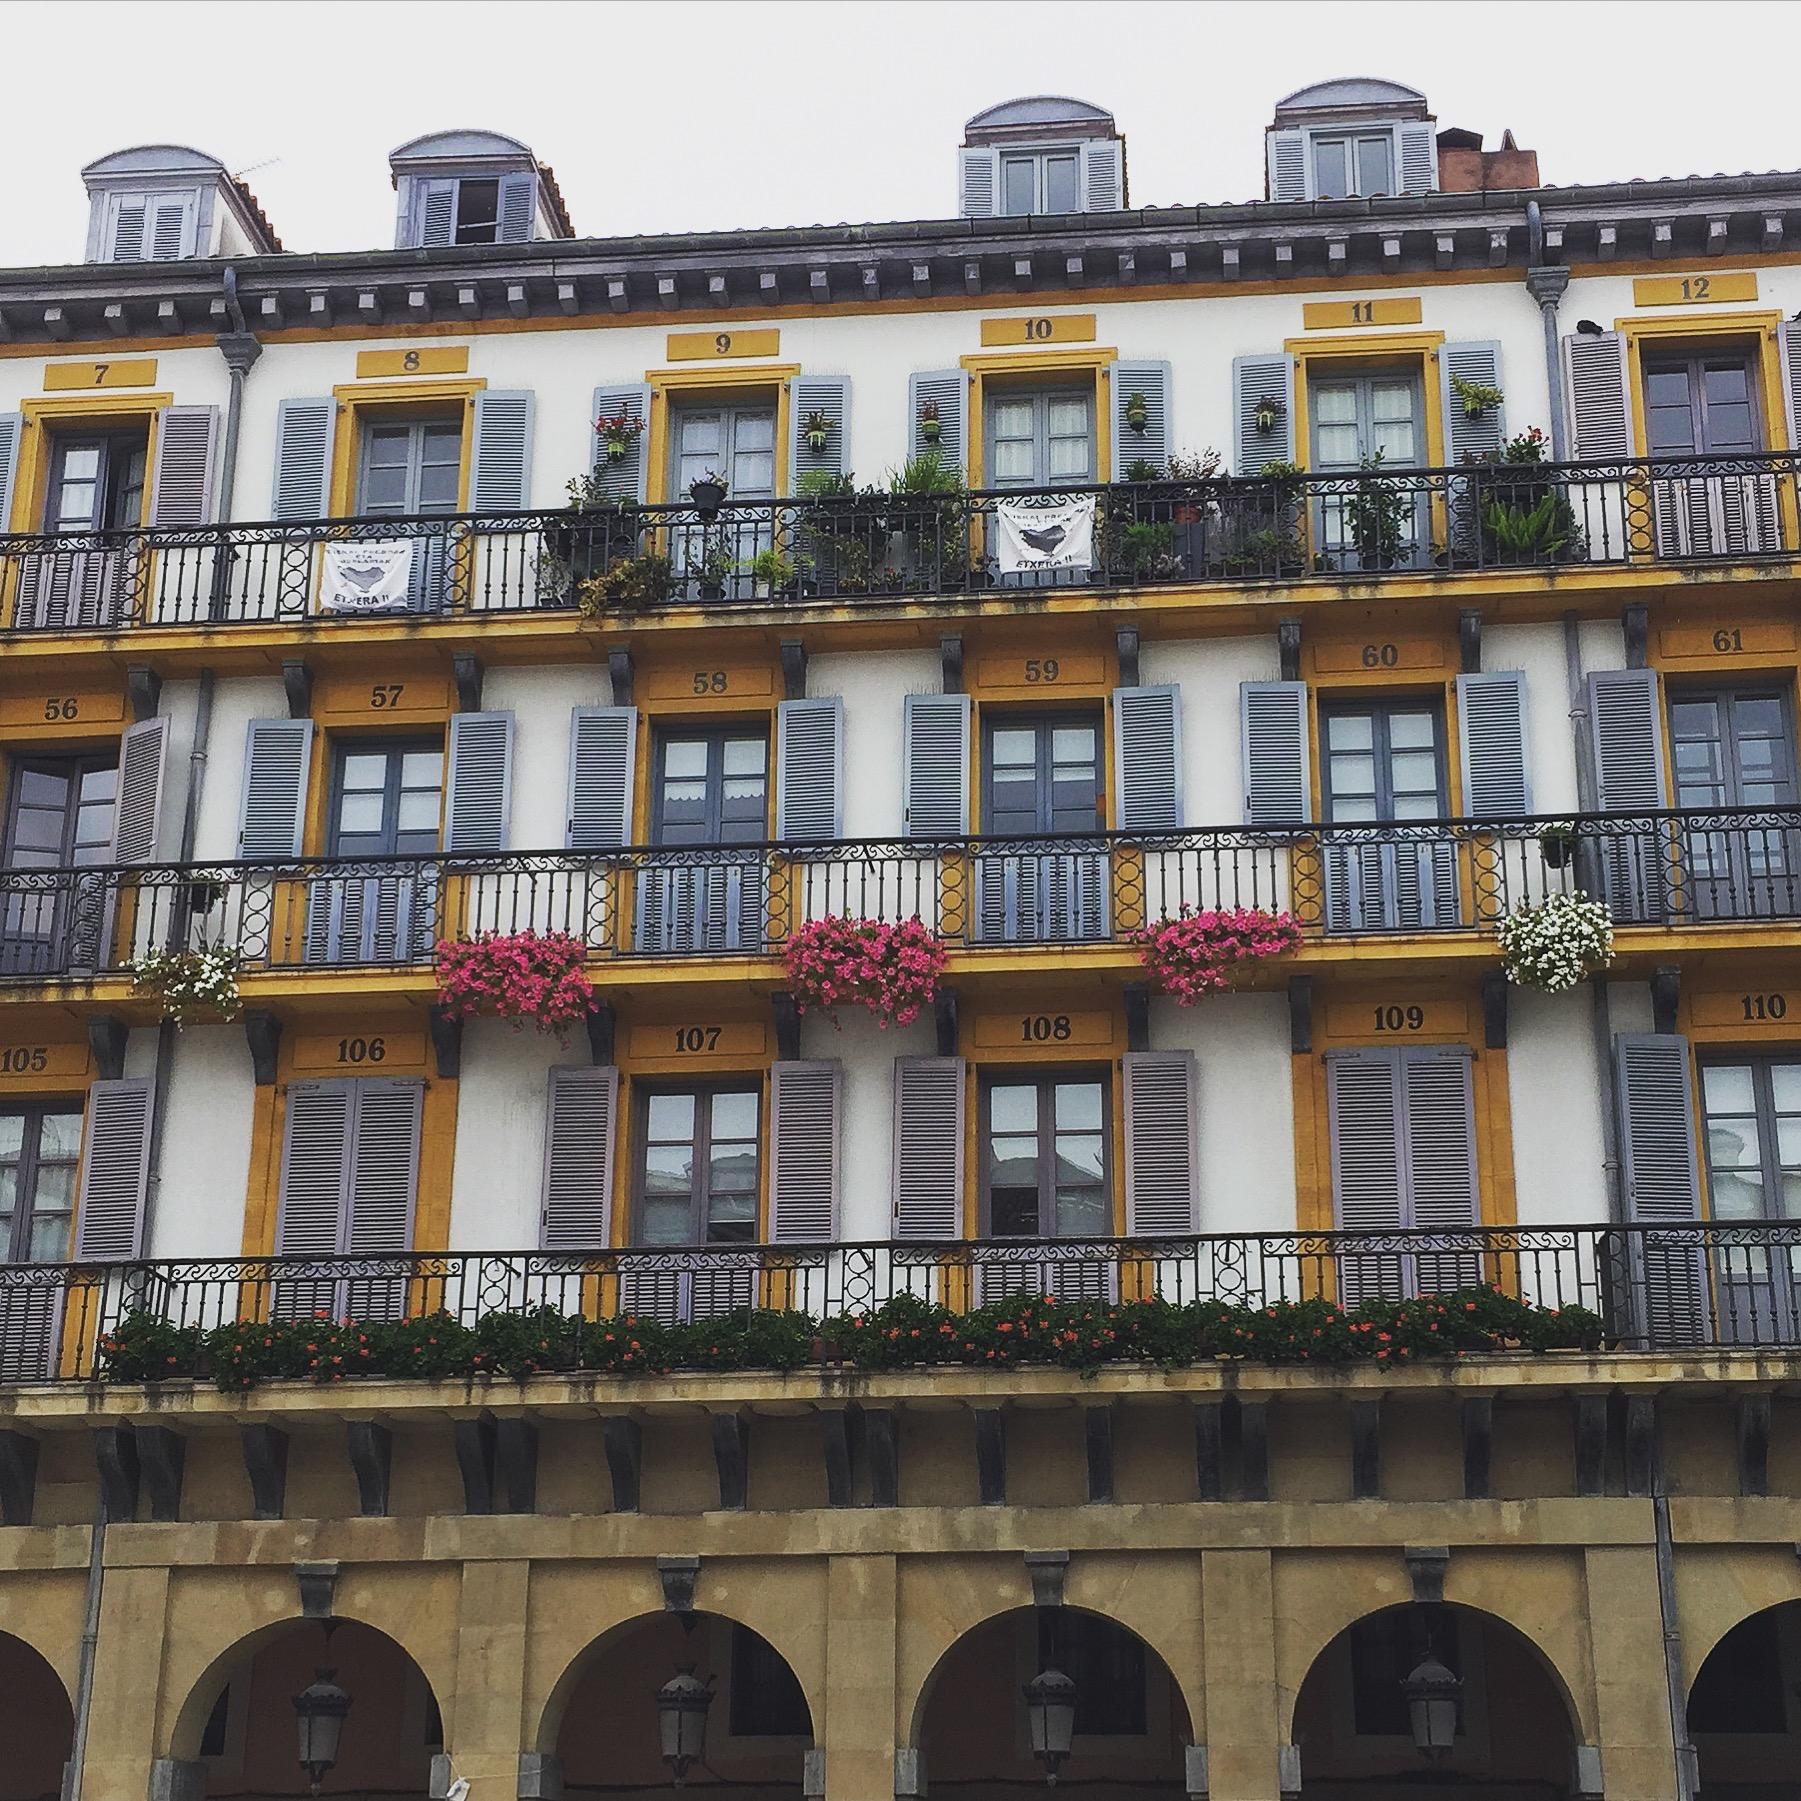 Old town, San Sebastián, Spain, Morso Travel food and wine tour.